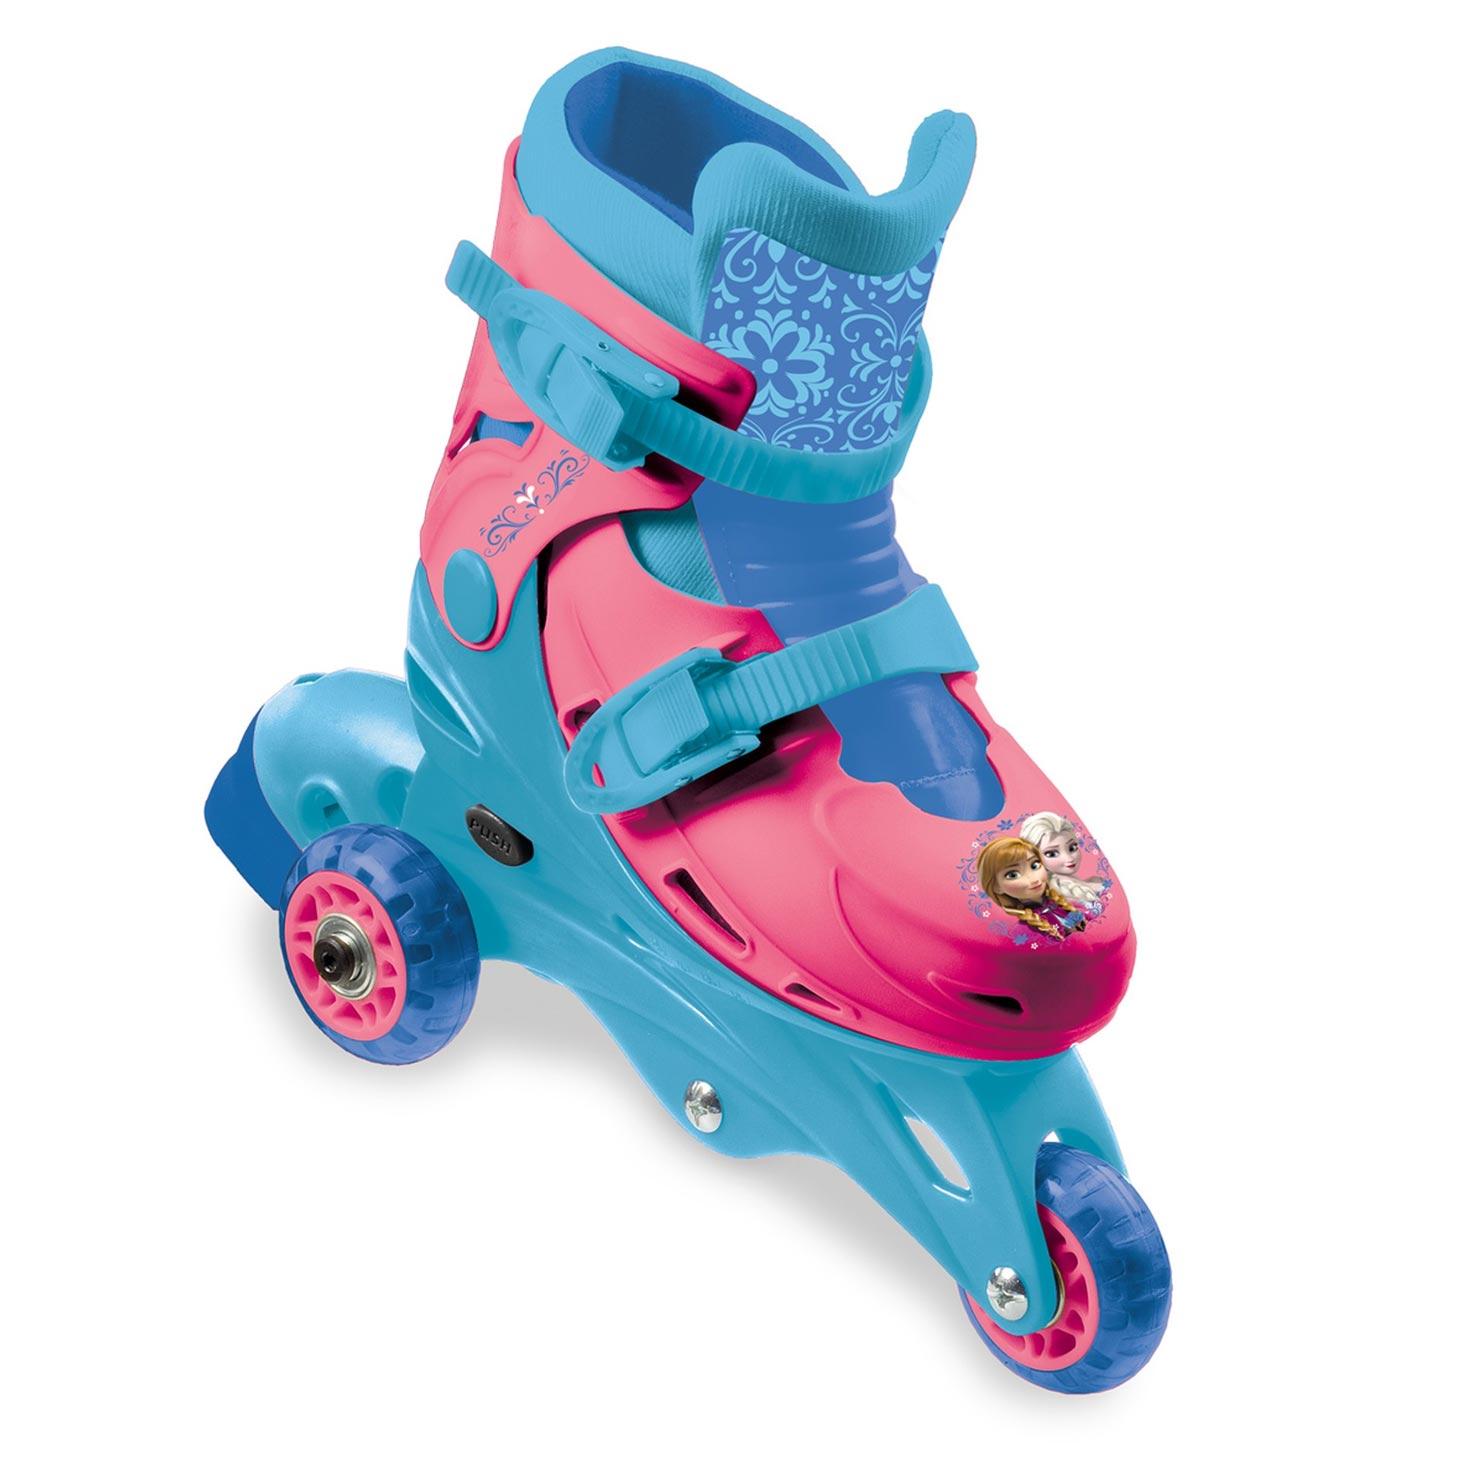 24c13f2f9fd Disney Frozen Tri Inlineskates/Skeelers online kopen   Lobbes.nl